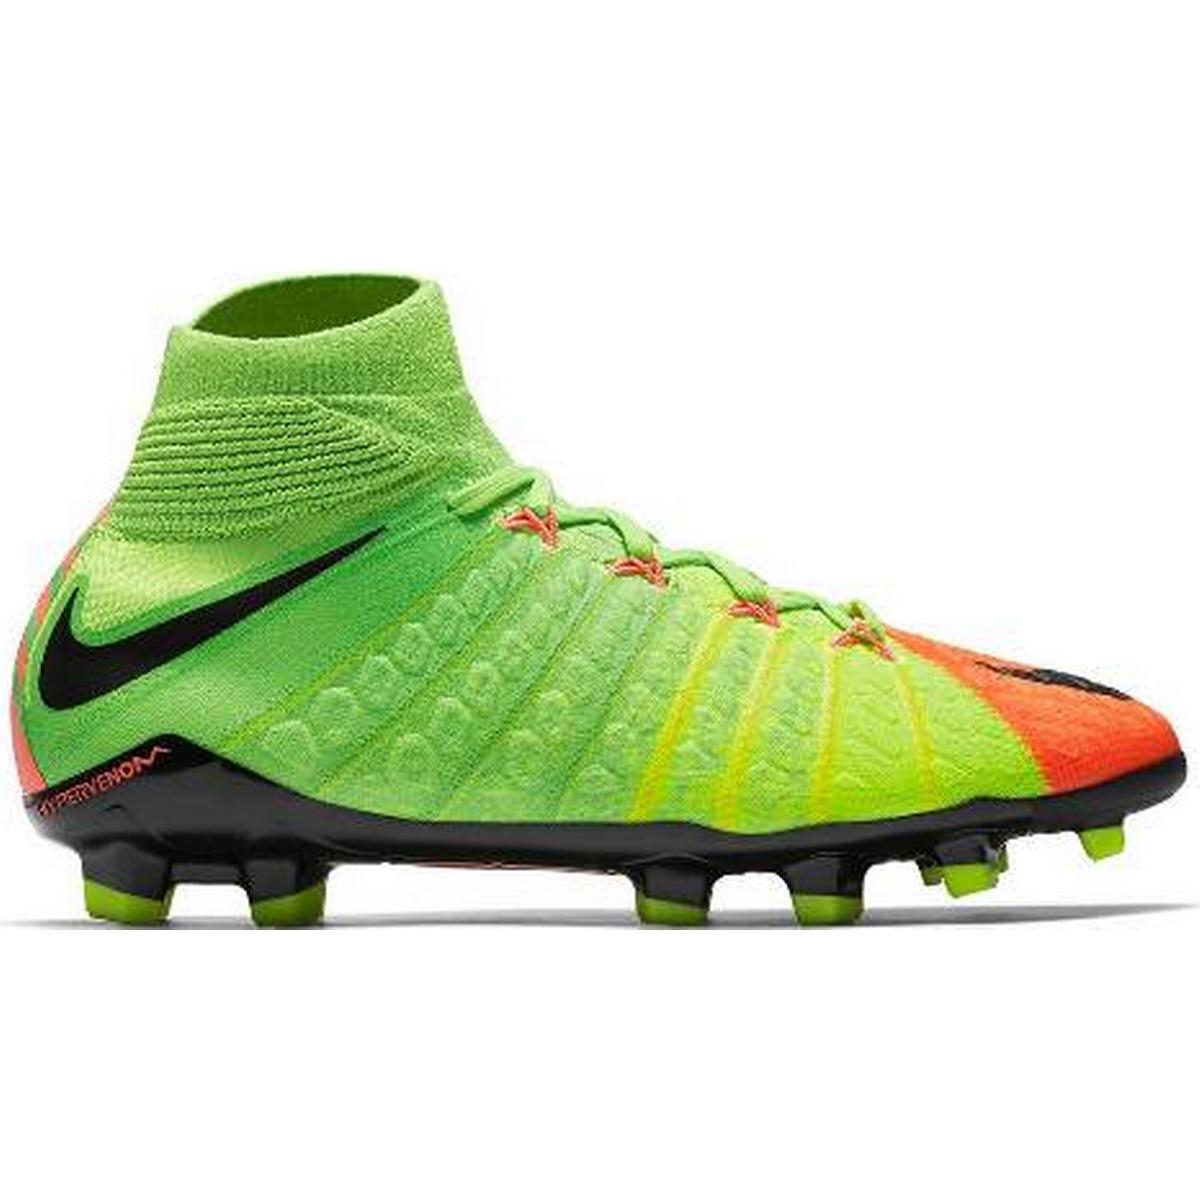 Billigsten Nike Jr. Hypervenomx Proximo Ii Dynamic Fit Ic